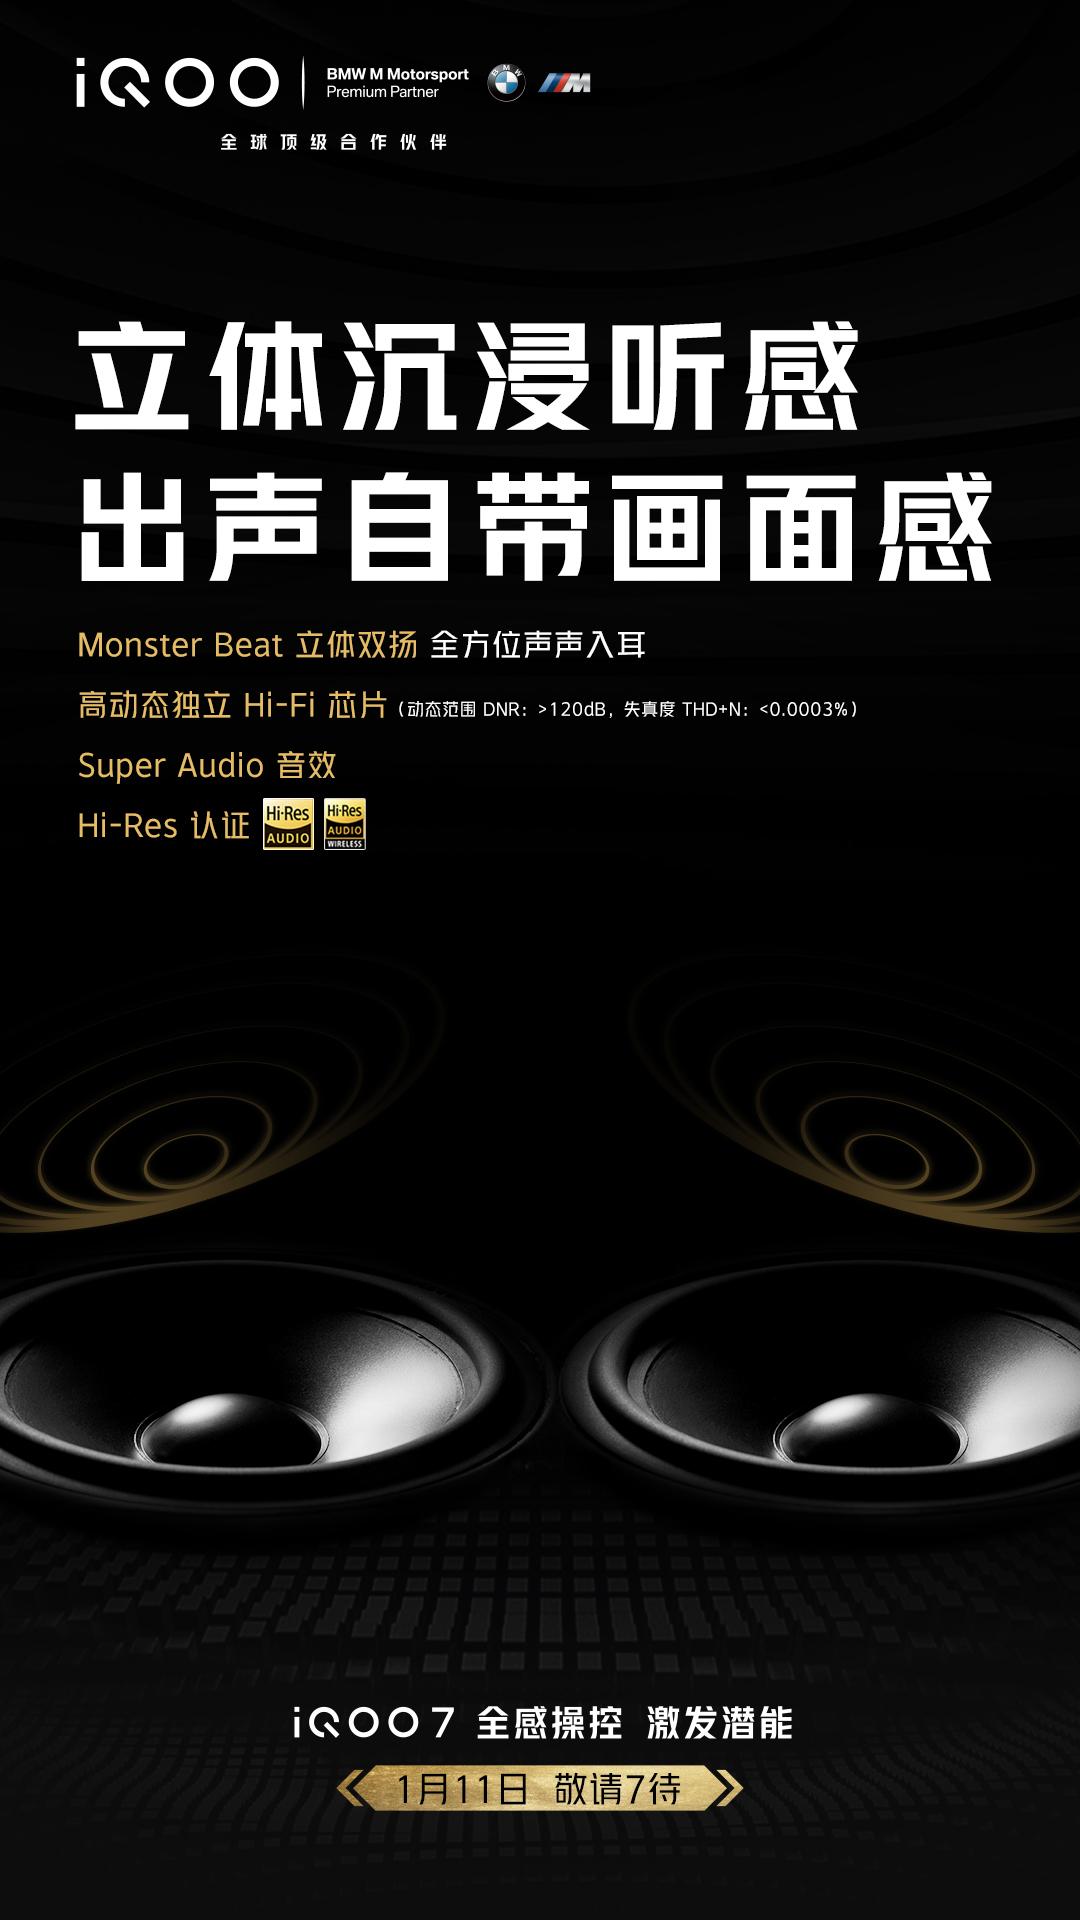 iQOO 7 Monster Beat Dual-speakers - Built-in HiFi chip